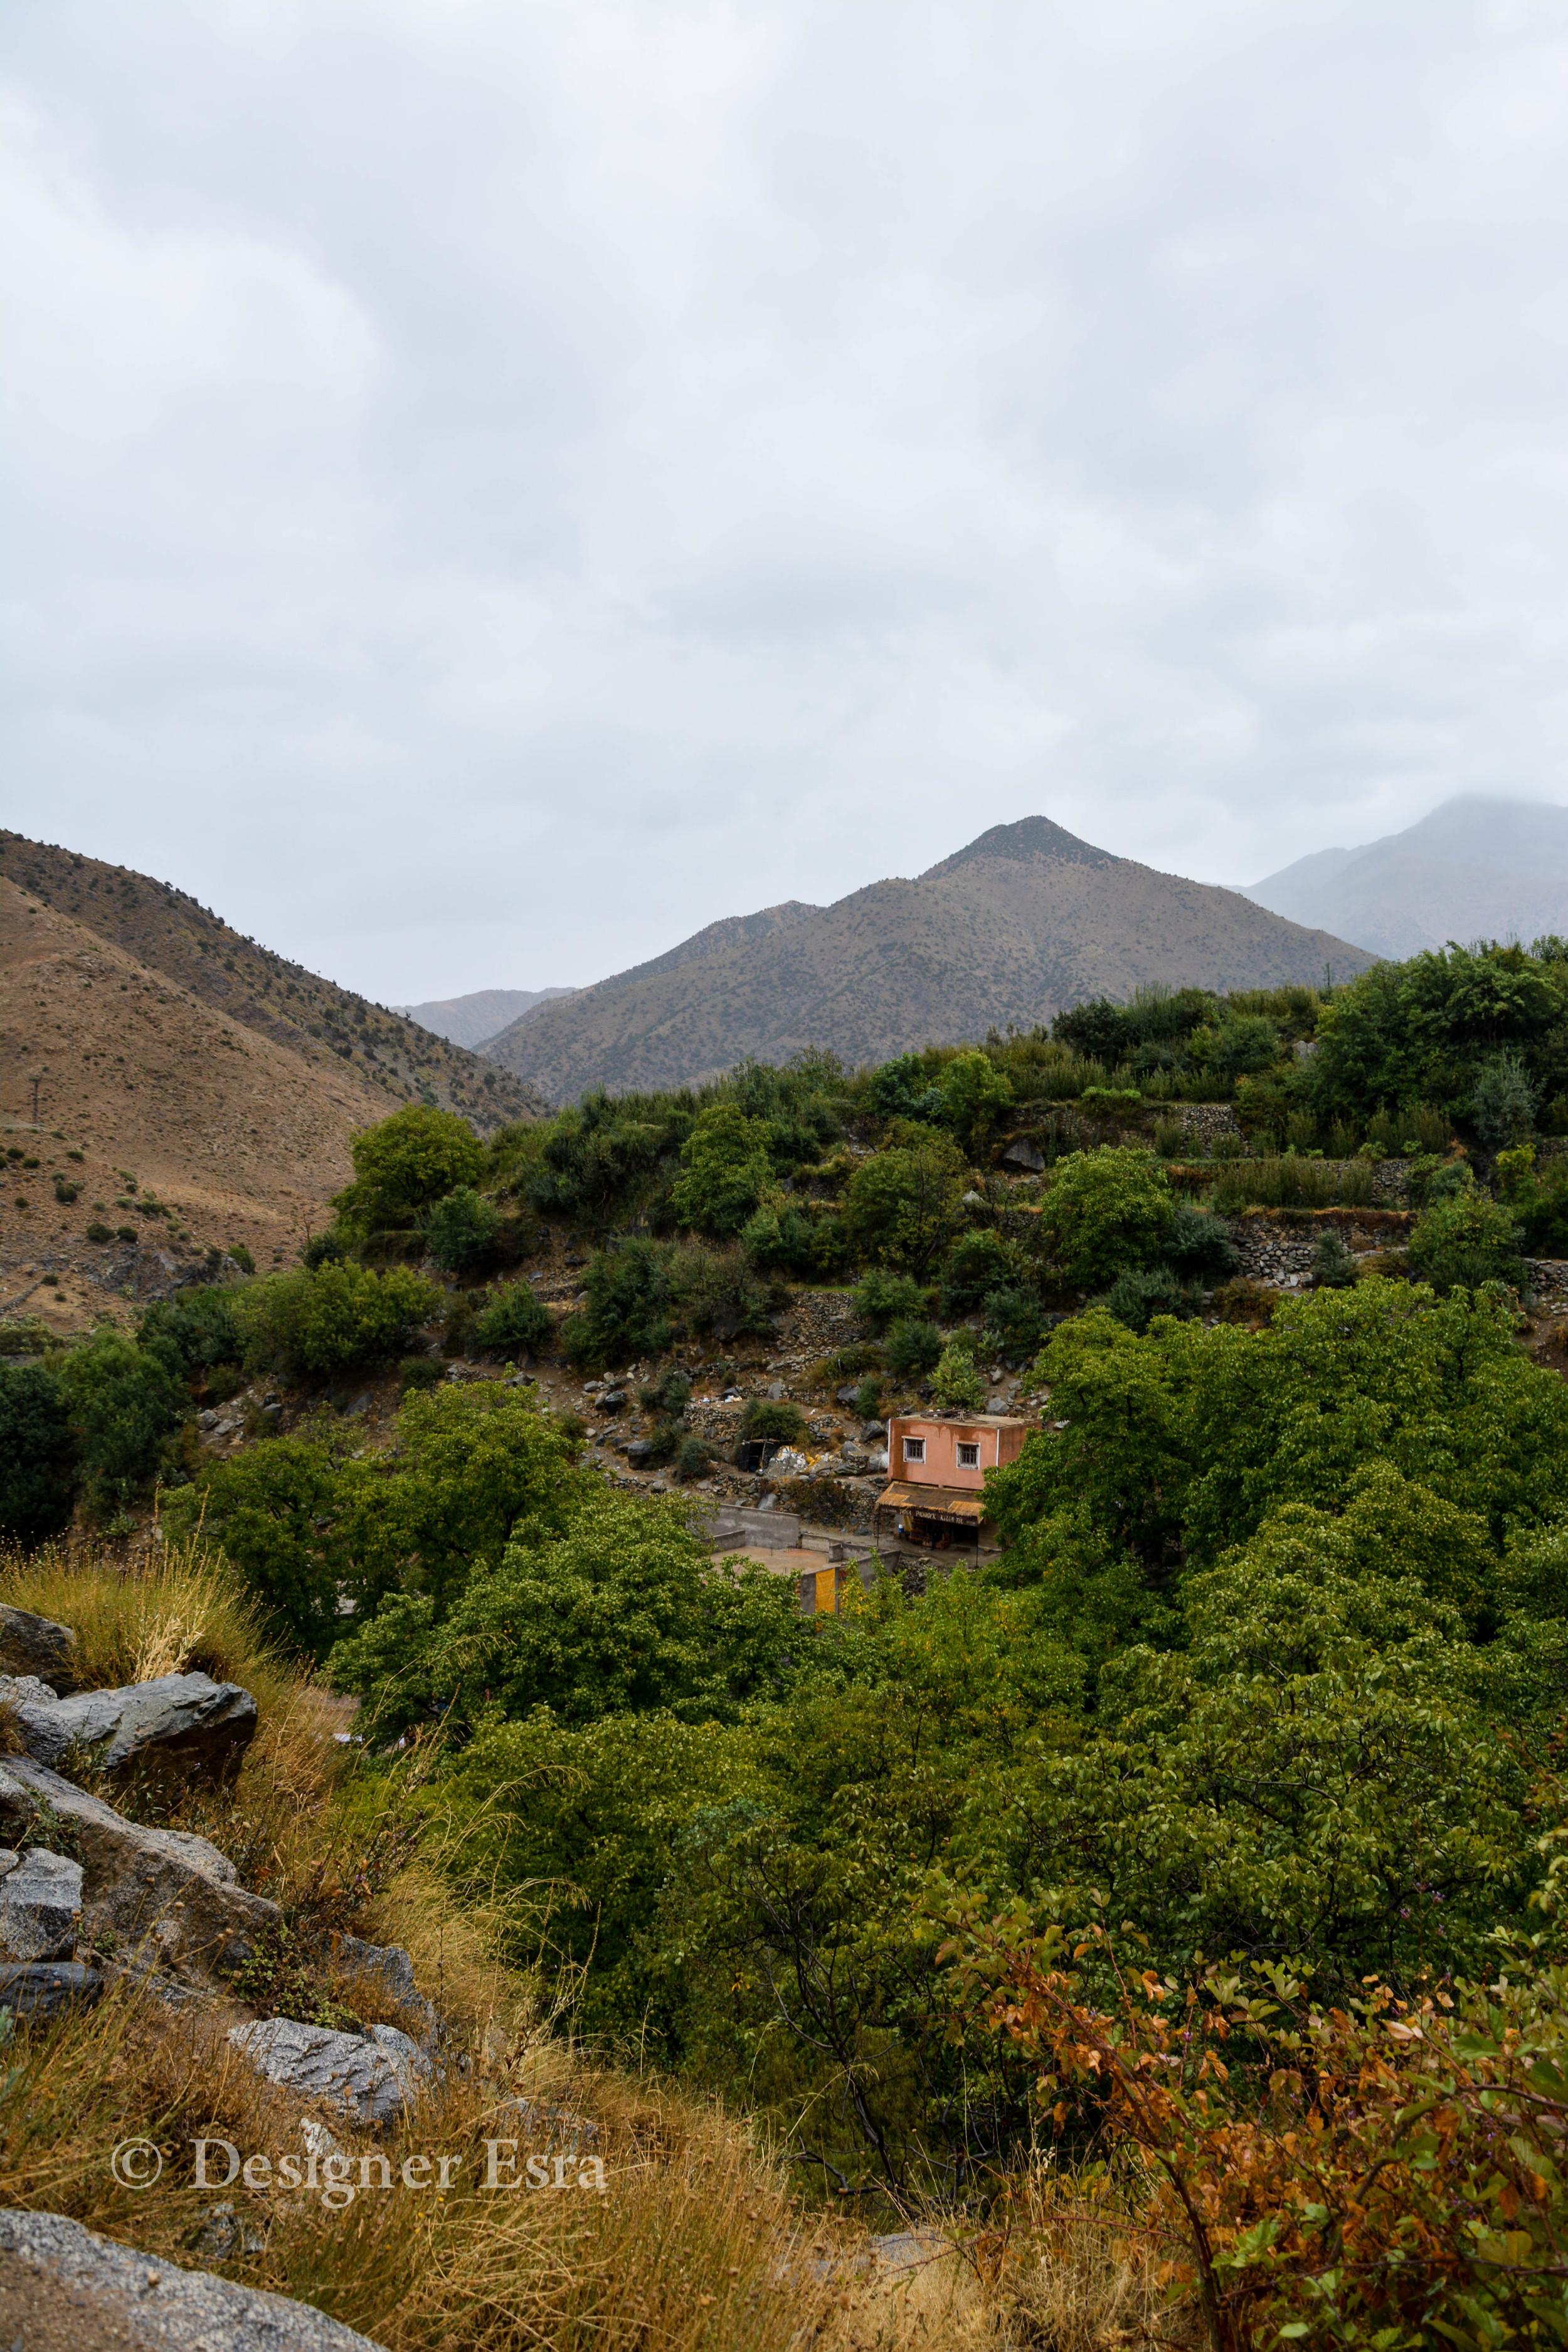 Finally some mountain views